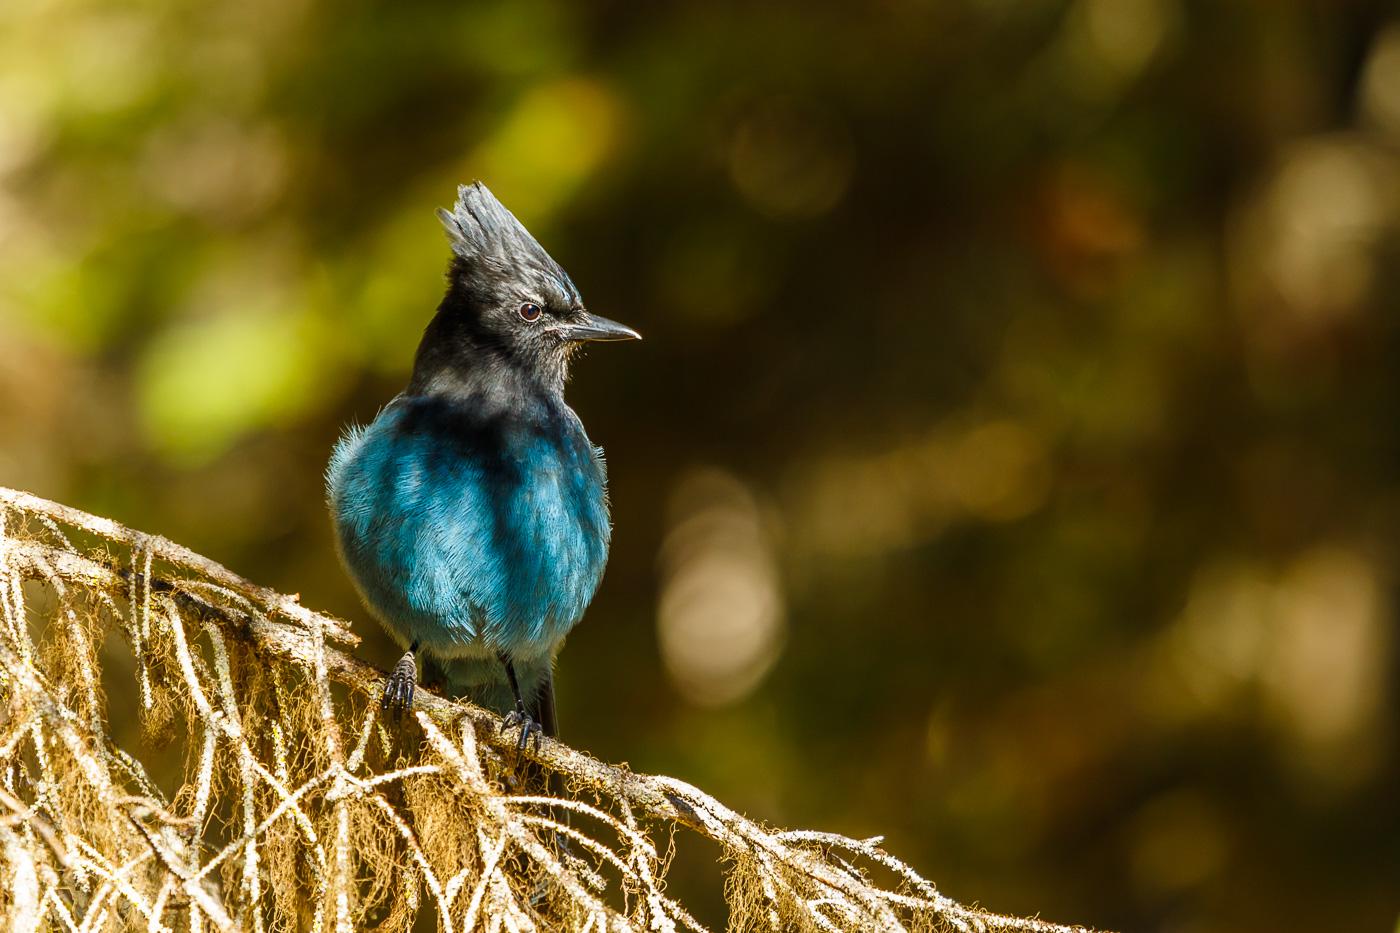 Steller's Jay (Cyanocitta stelleri), Yoho National Park, Canada. - Fauna de Nord-Amèrica - Raül Carmona - Fotografia, Fotografia d'estudi, esdeveniments i Natura